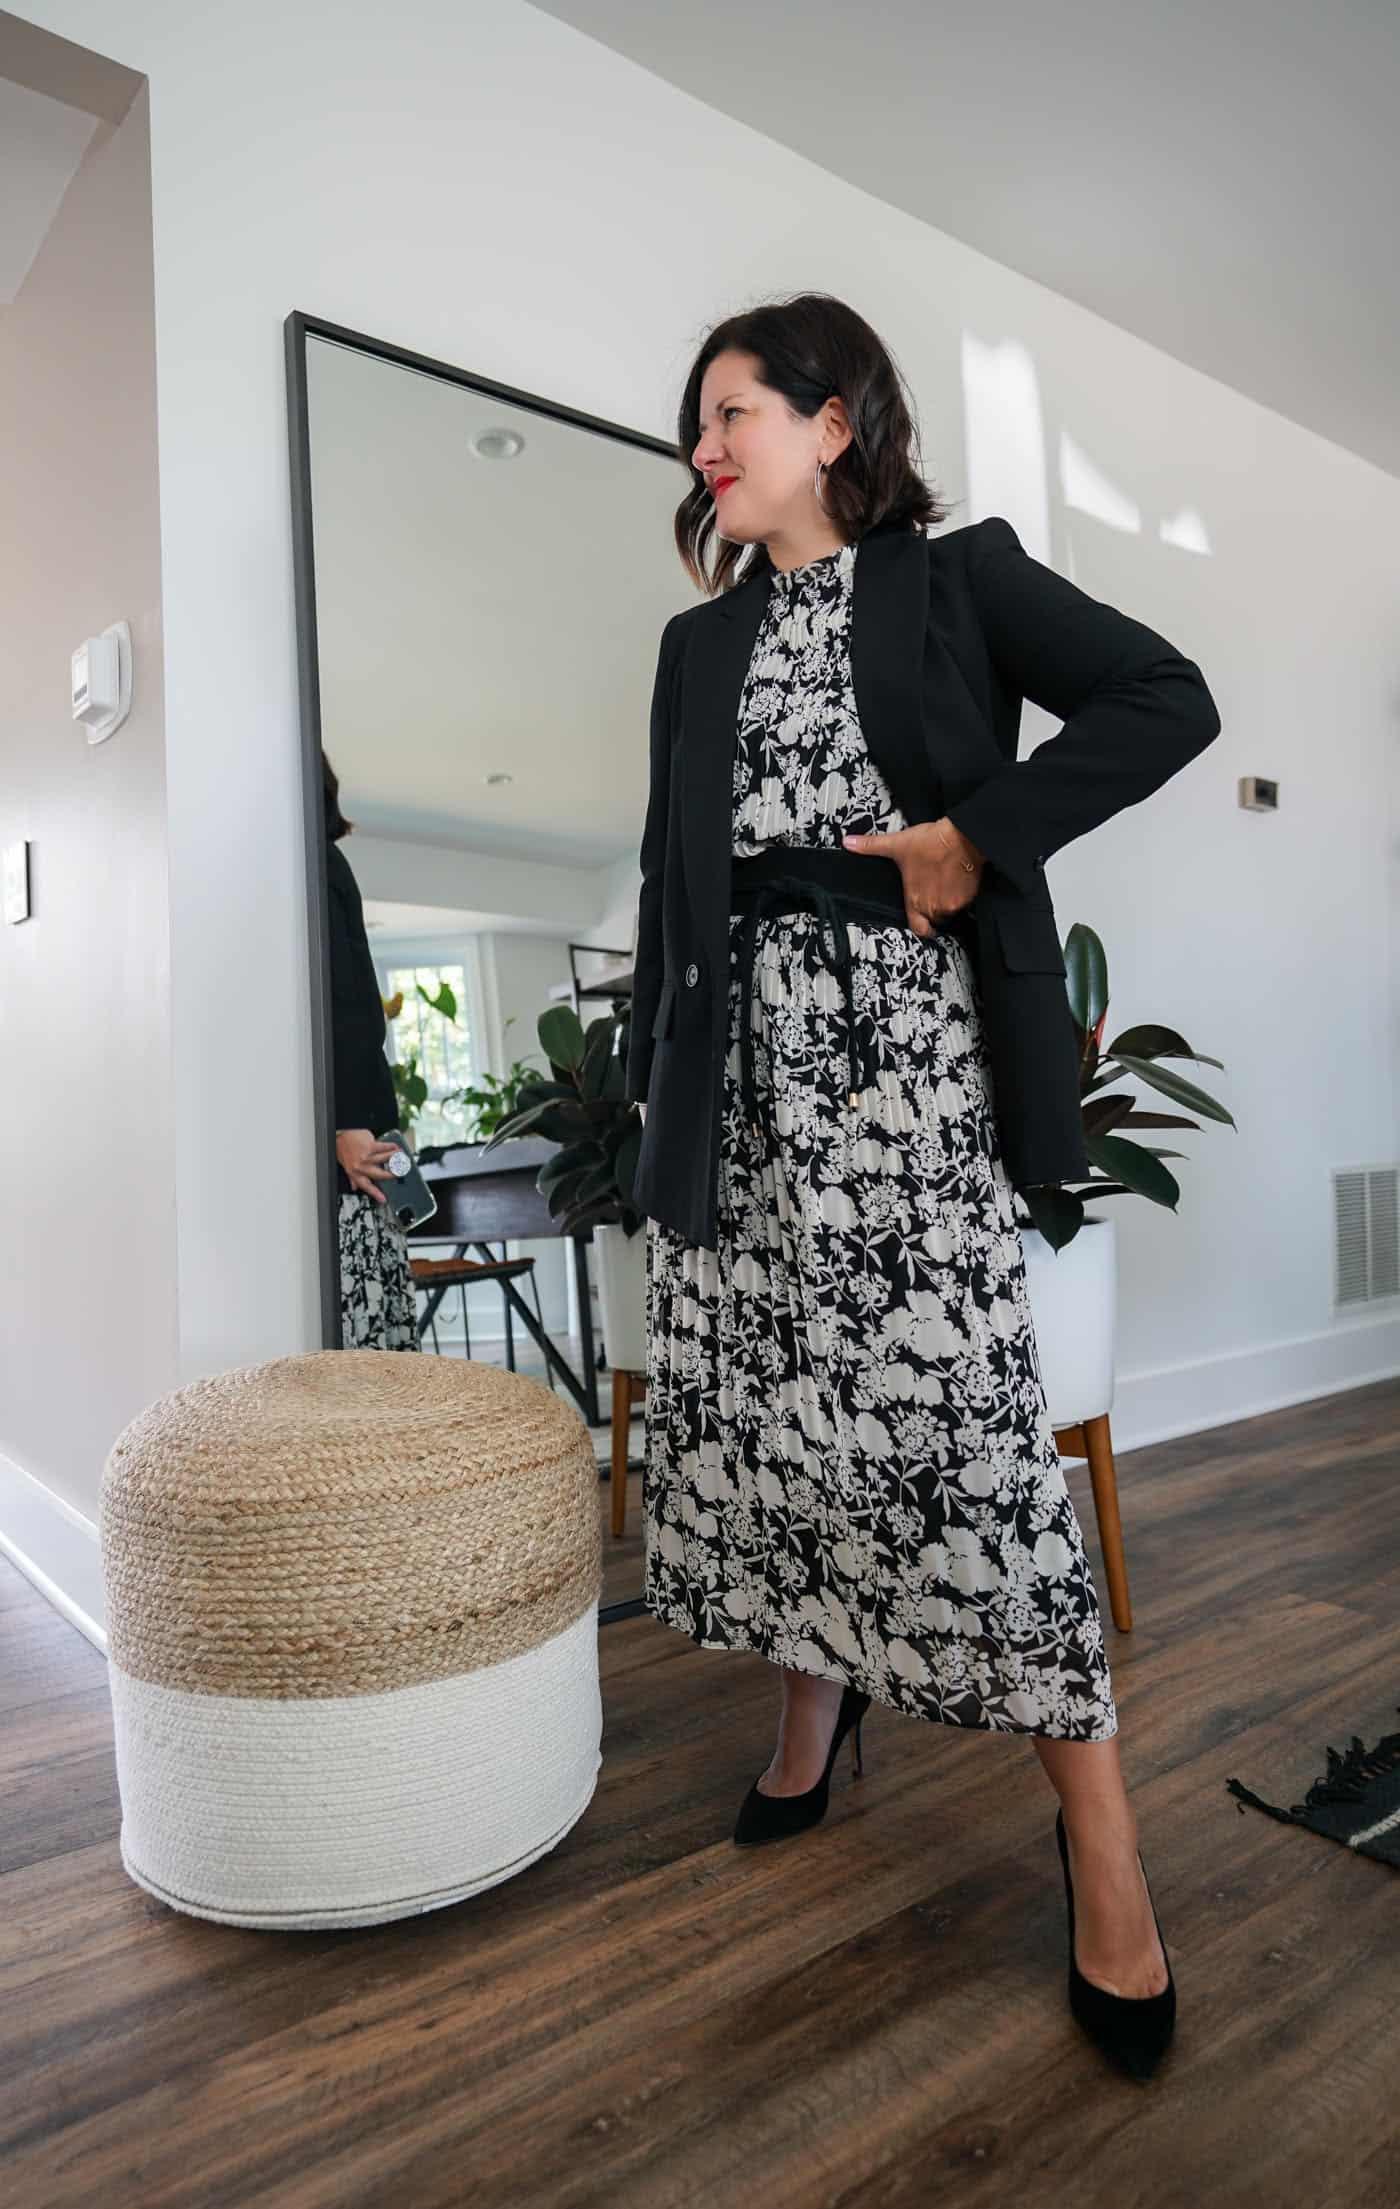 Womens black blazer and a maxi dress